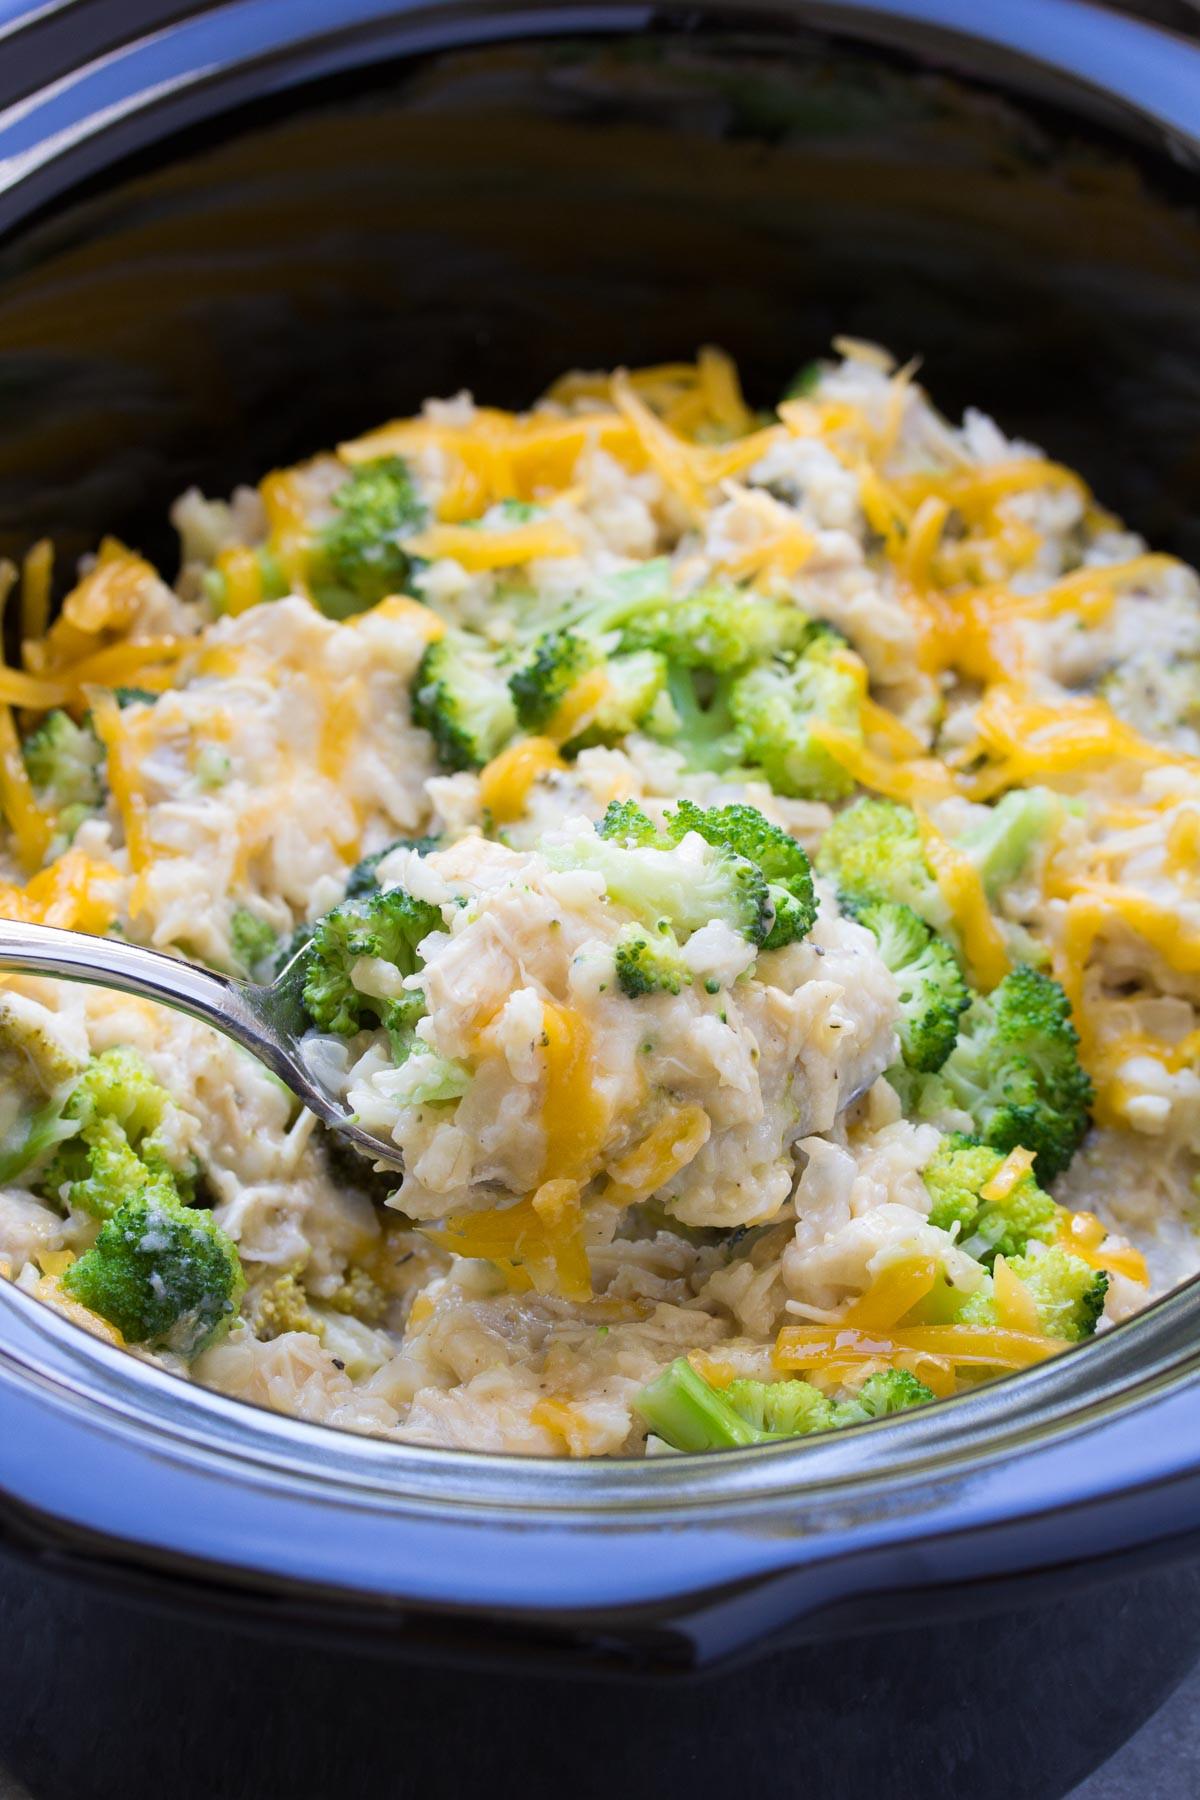 Chicken Broccoli And Rice Casserole Healthy  Slow Cooker Chicken Broccoli and Rice Casserole